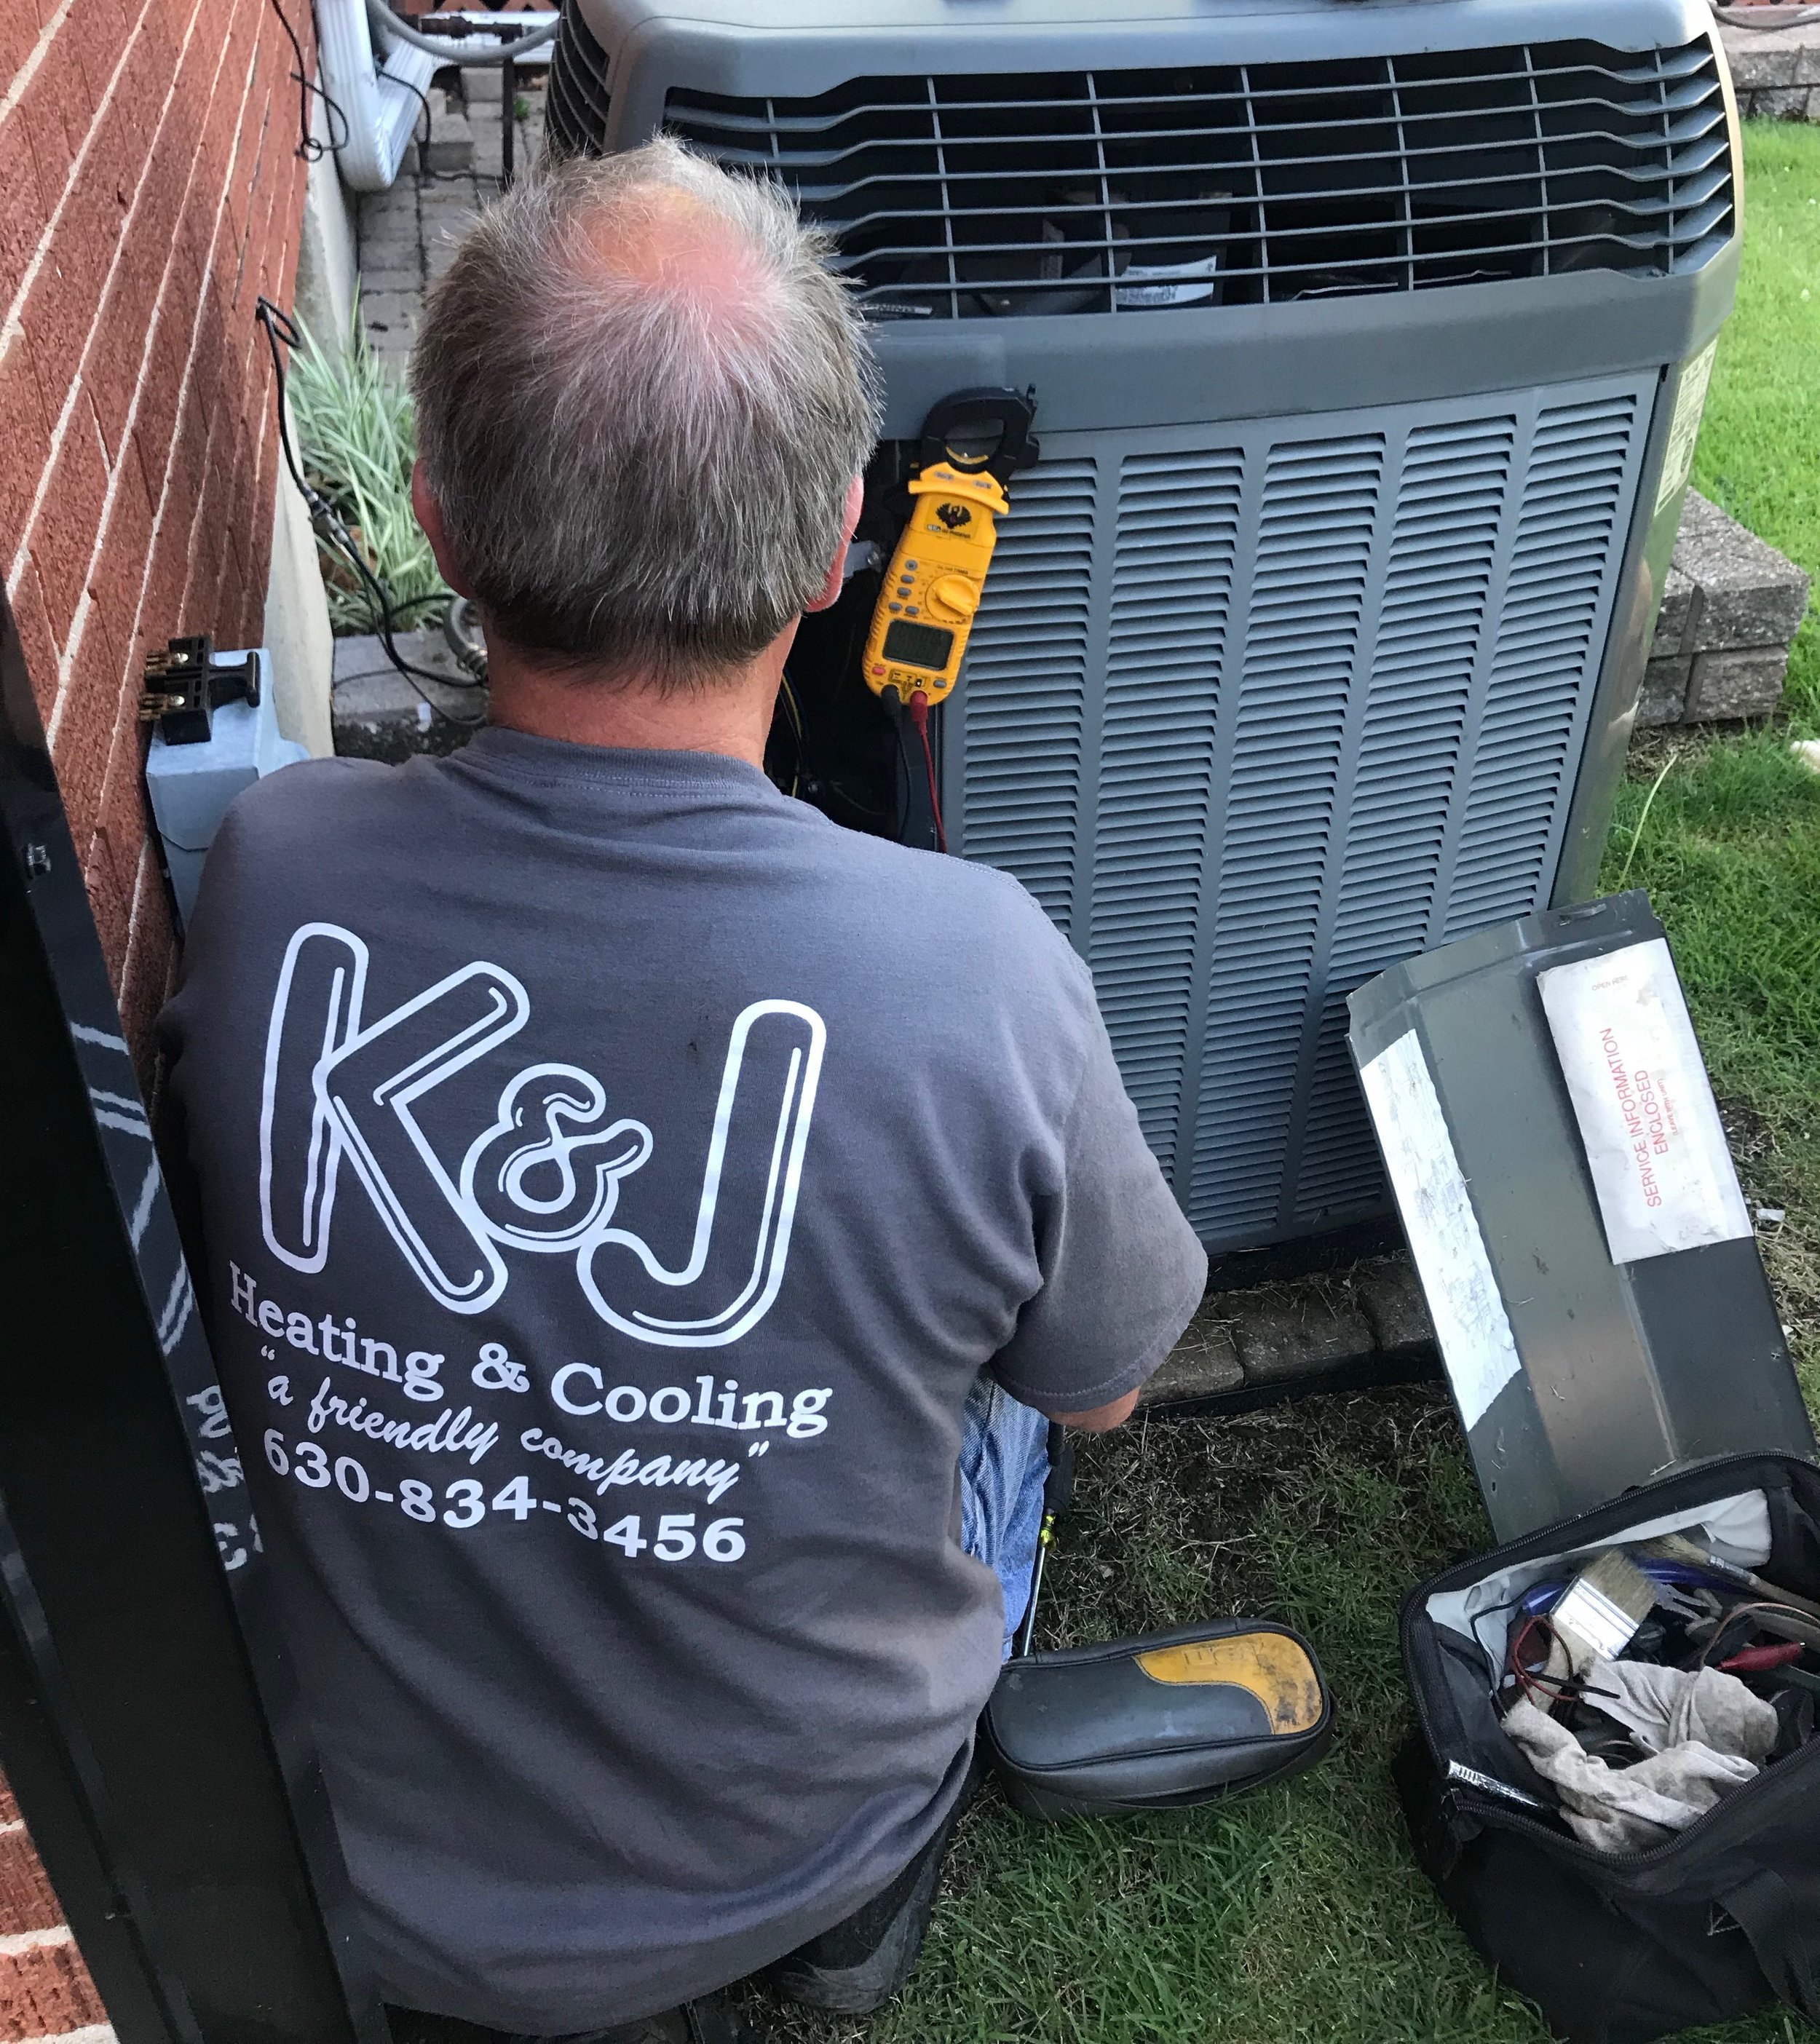 Club K & J Air Conditioner Maintenance Program